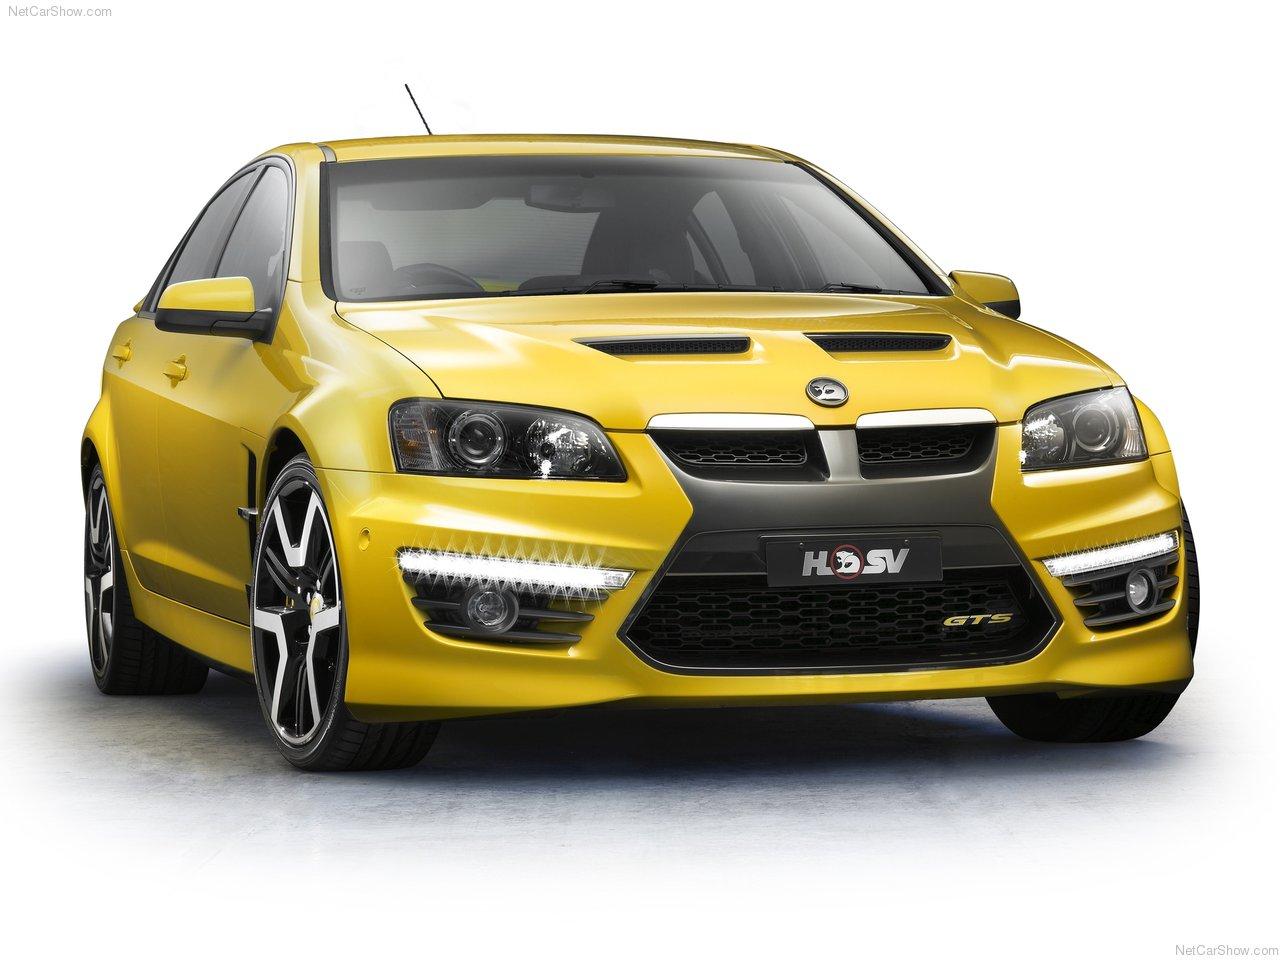 2011 HSV E3 GTS